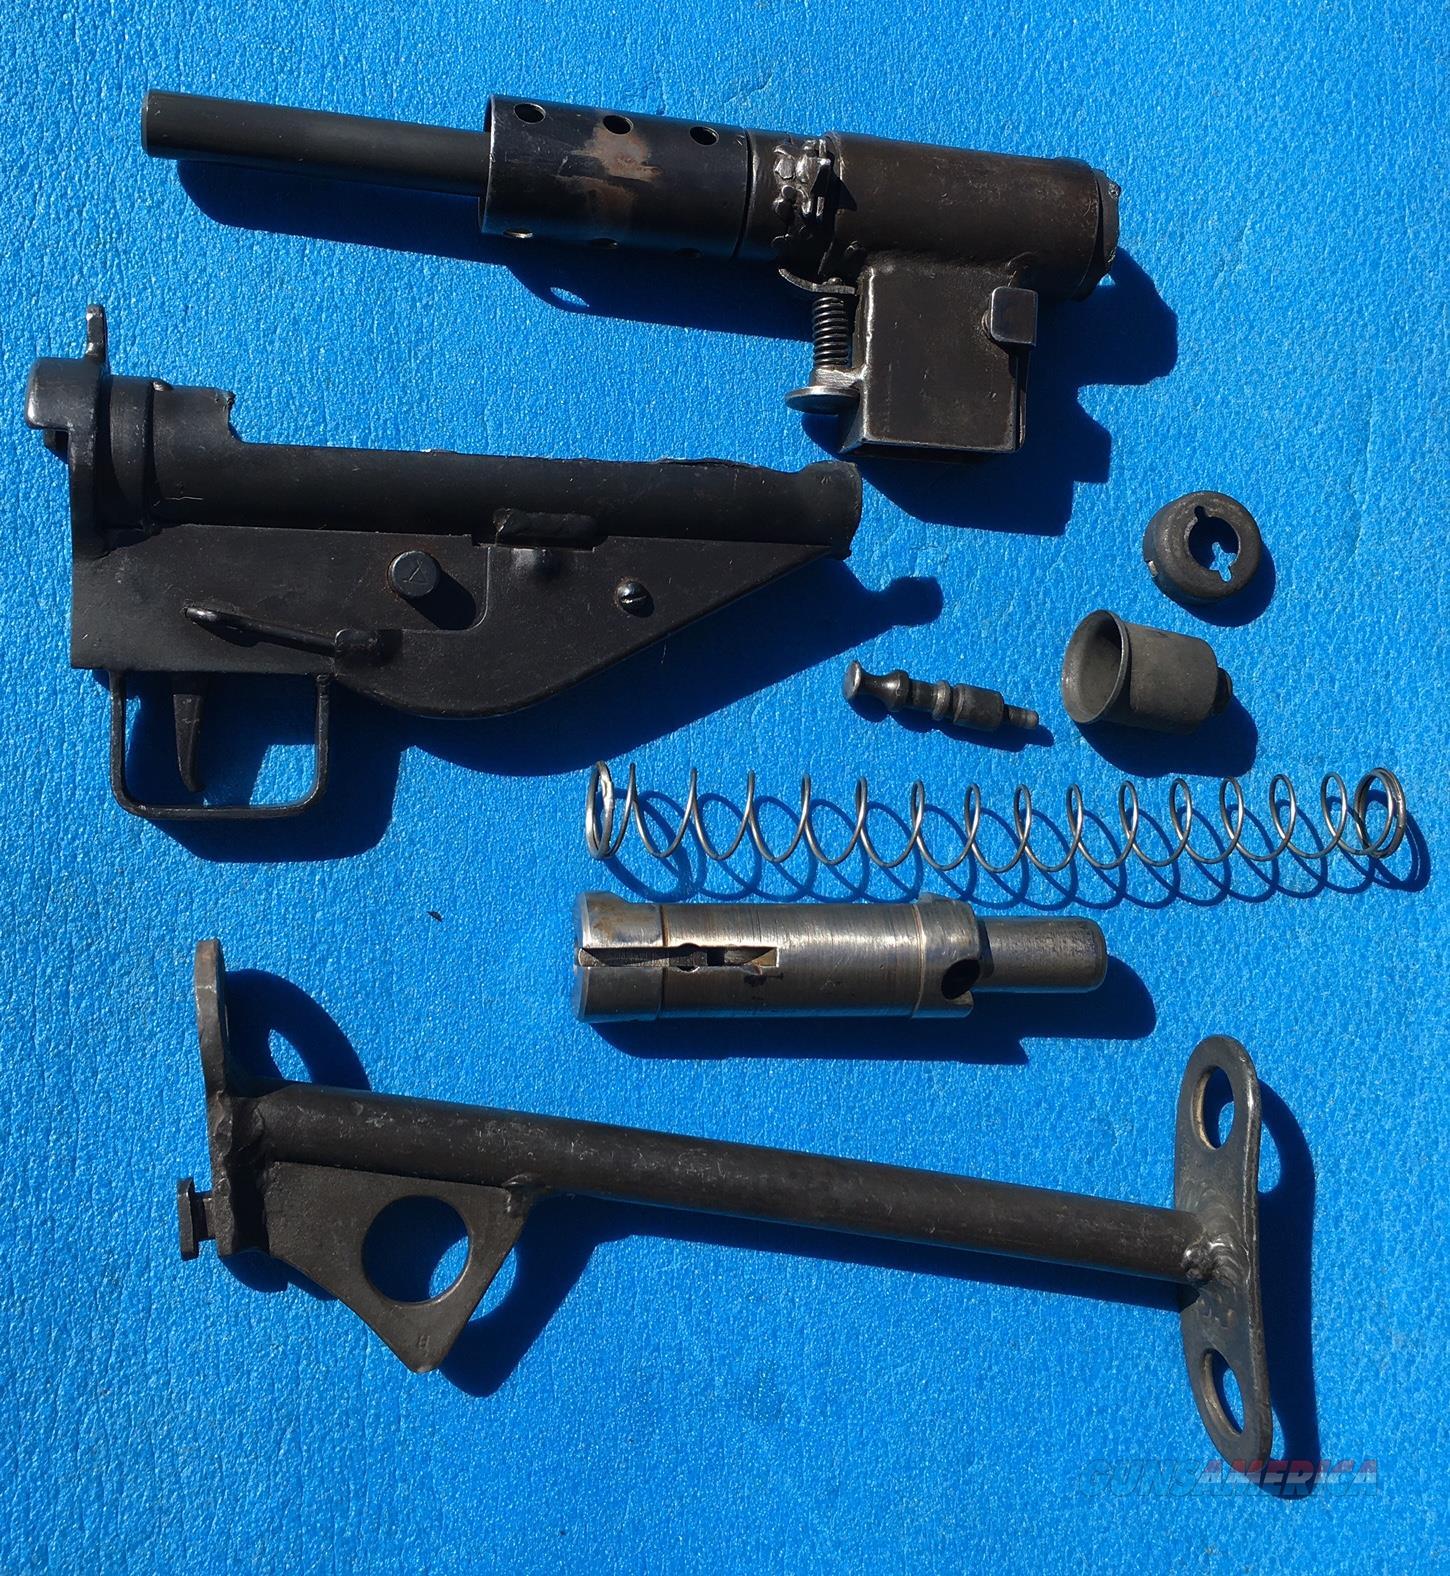 STEN MK2 British parts kit with new American barrel